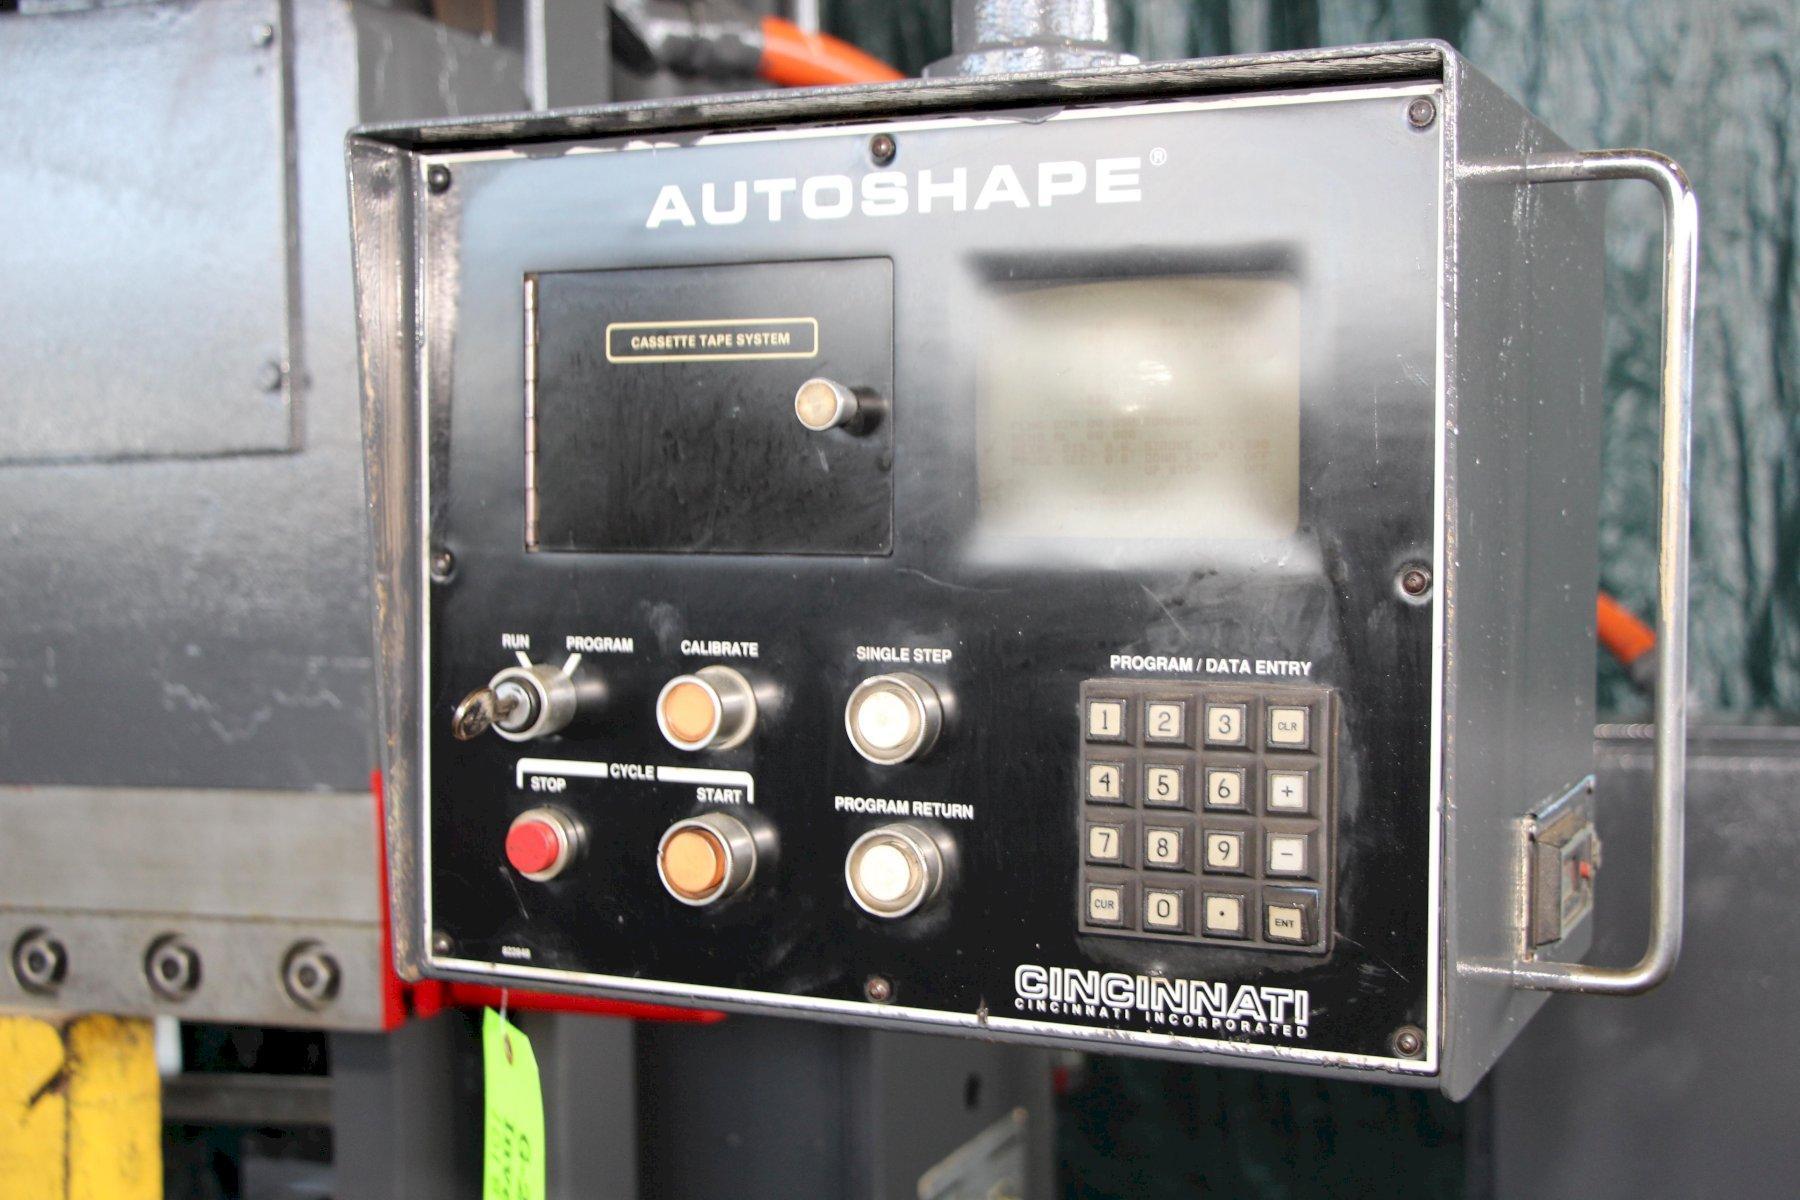 175 Ton x 10' Cincinnati CNC Autoshape AS175-8 Hydraulic Press Brake